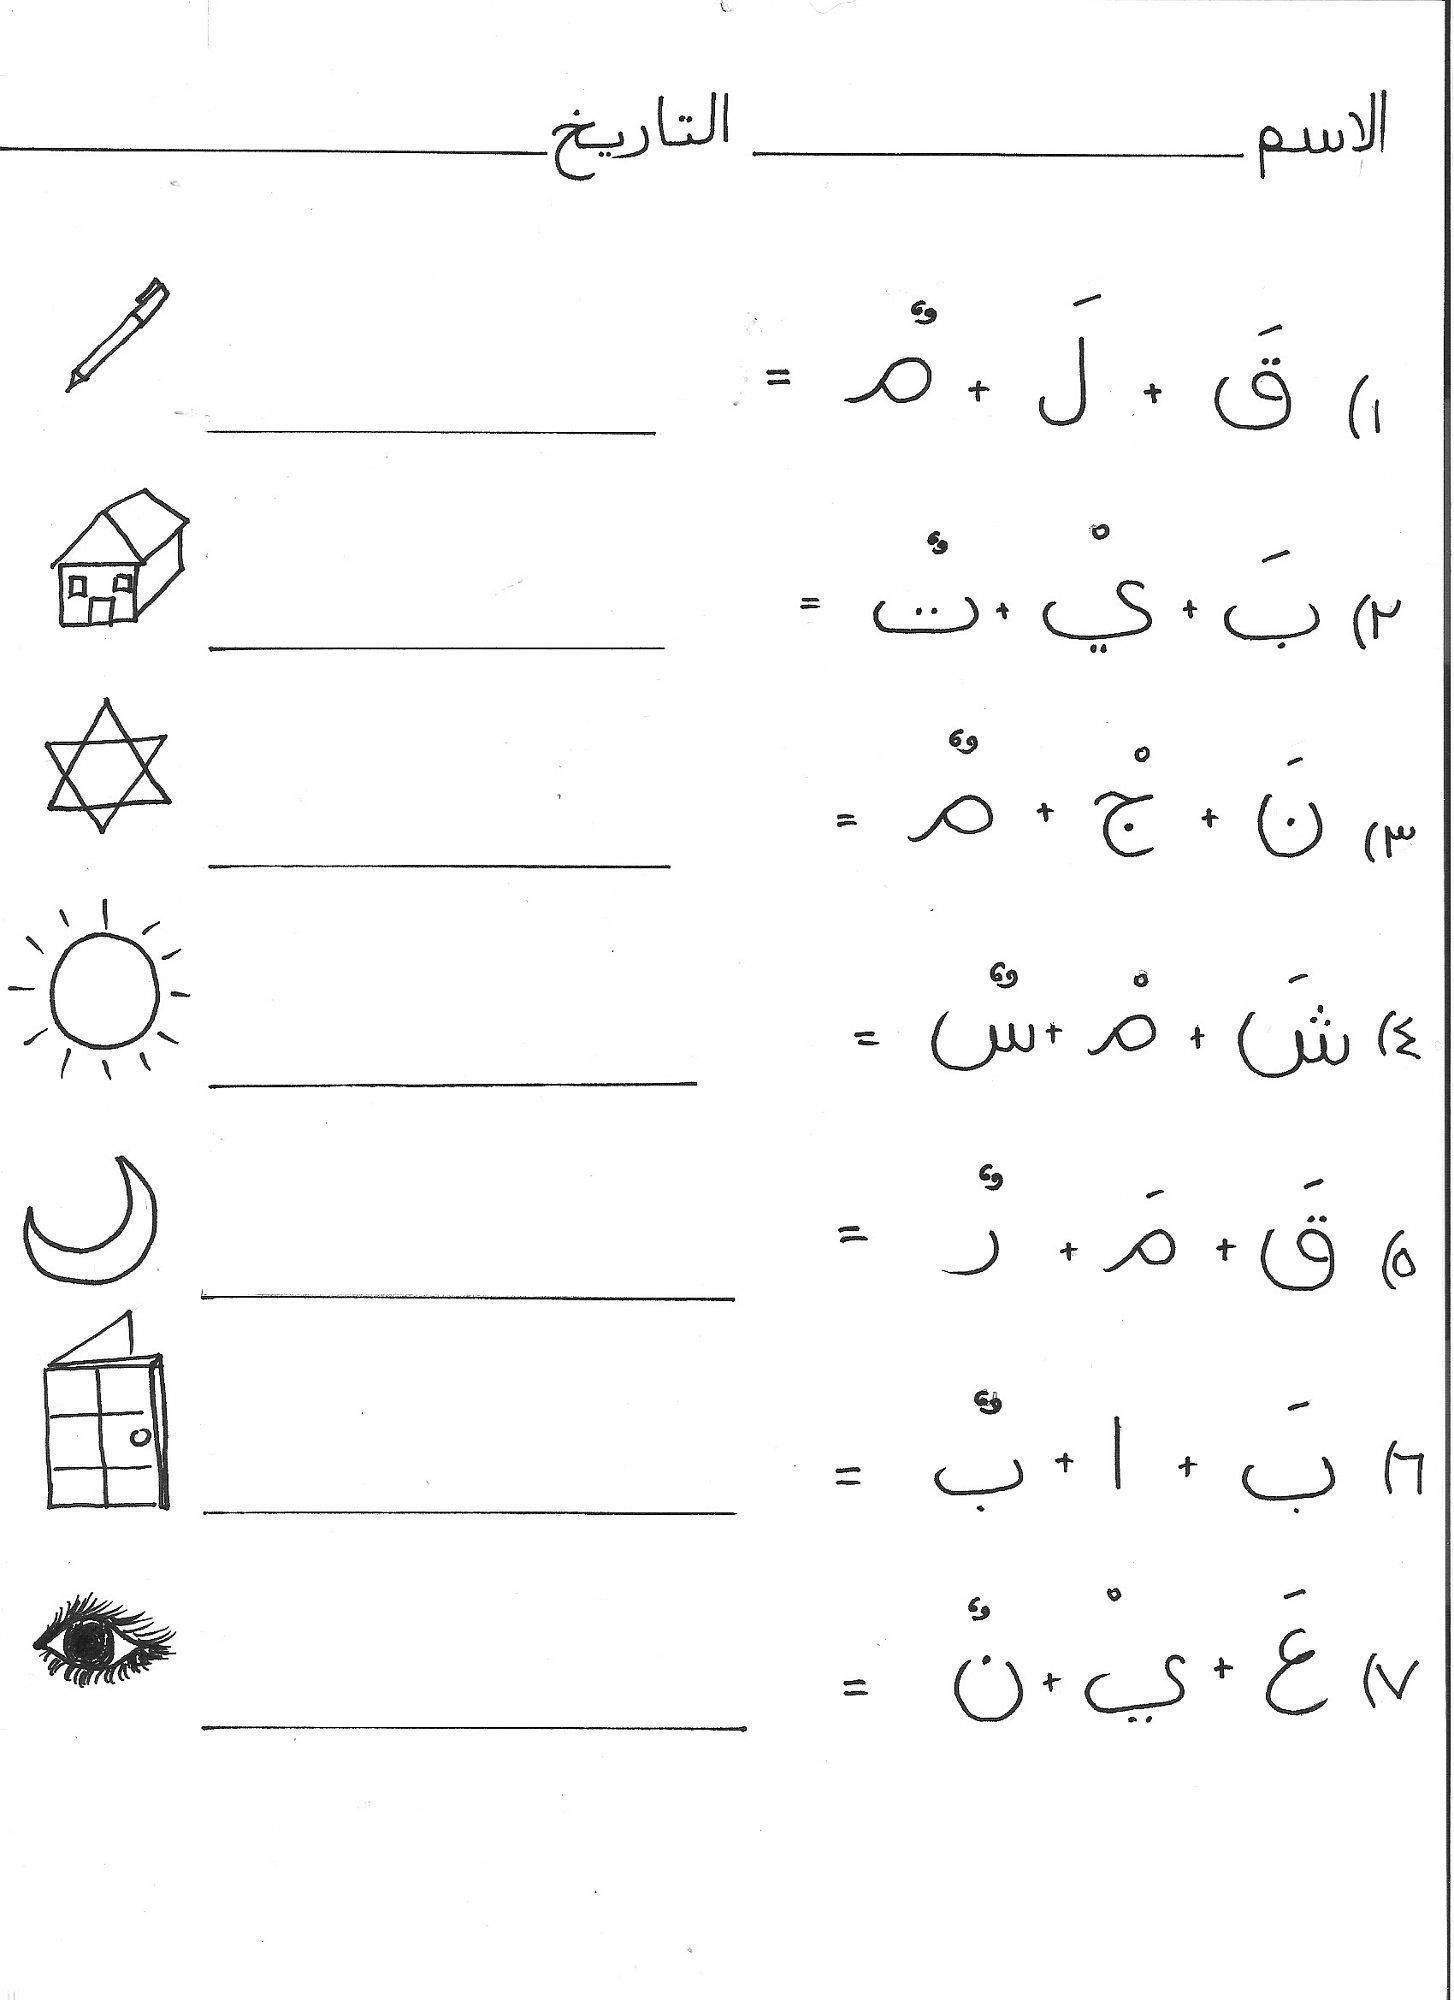 Arabic Alphabet Writing Practice Worksheets Arabic